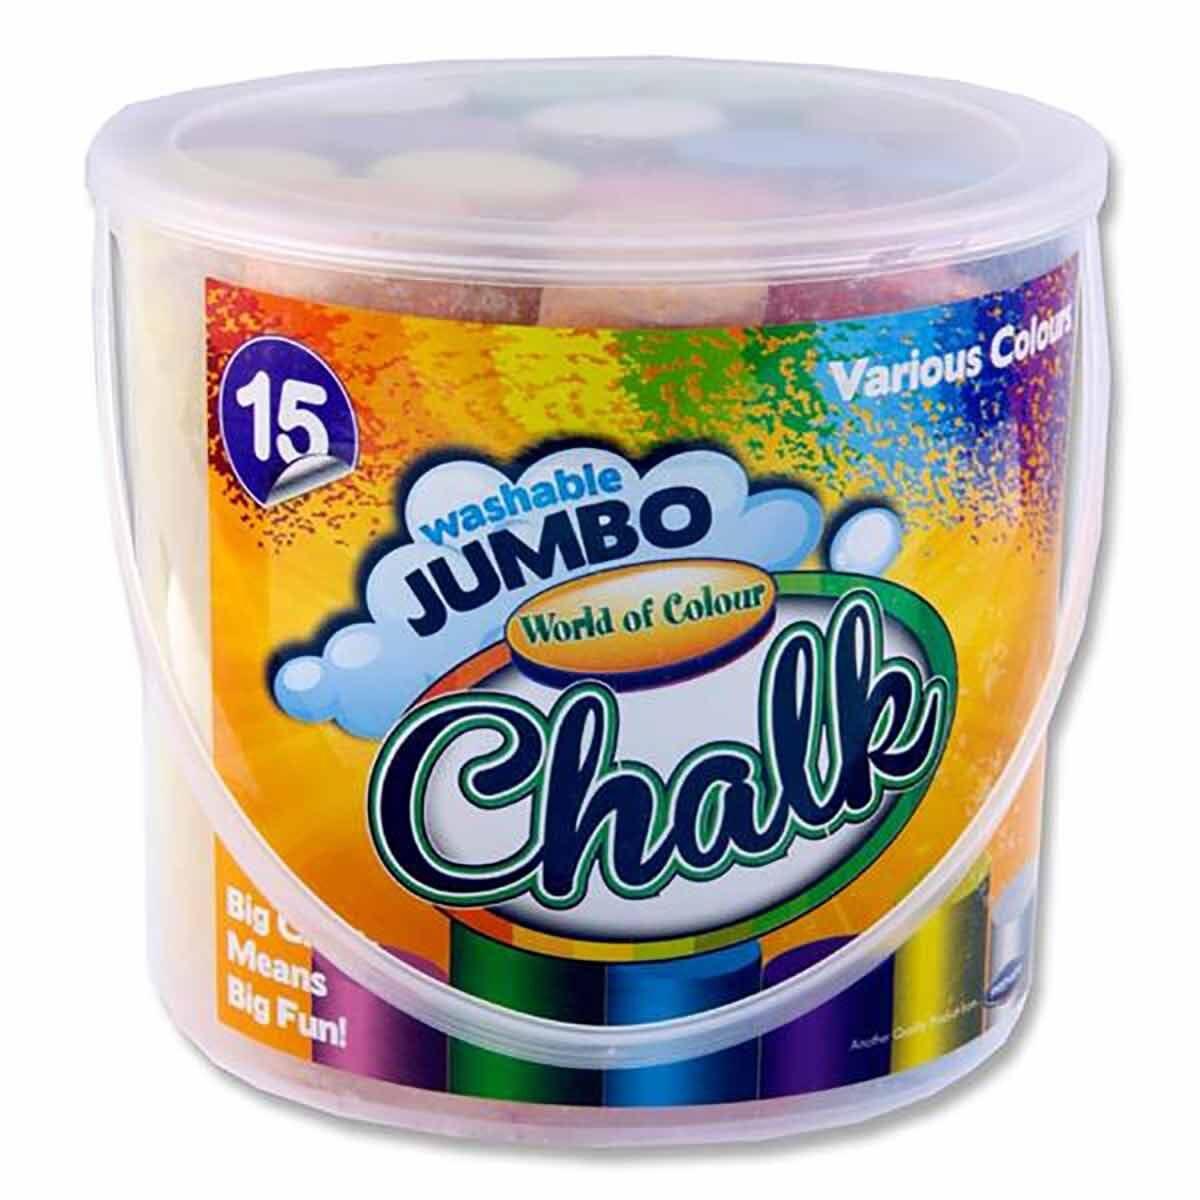 World of Colour 15 Jumbo Sidewalk Chalks Assorted